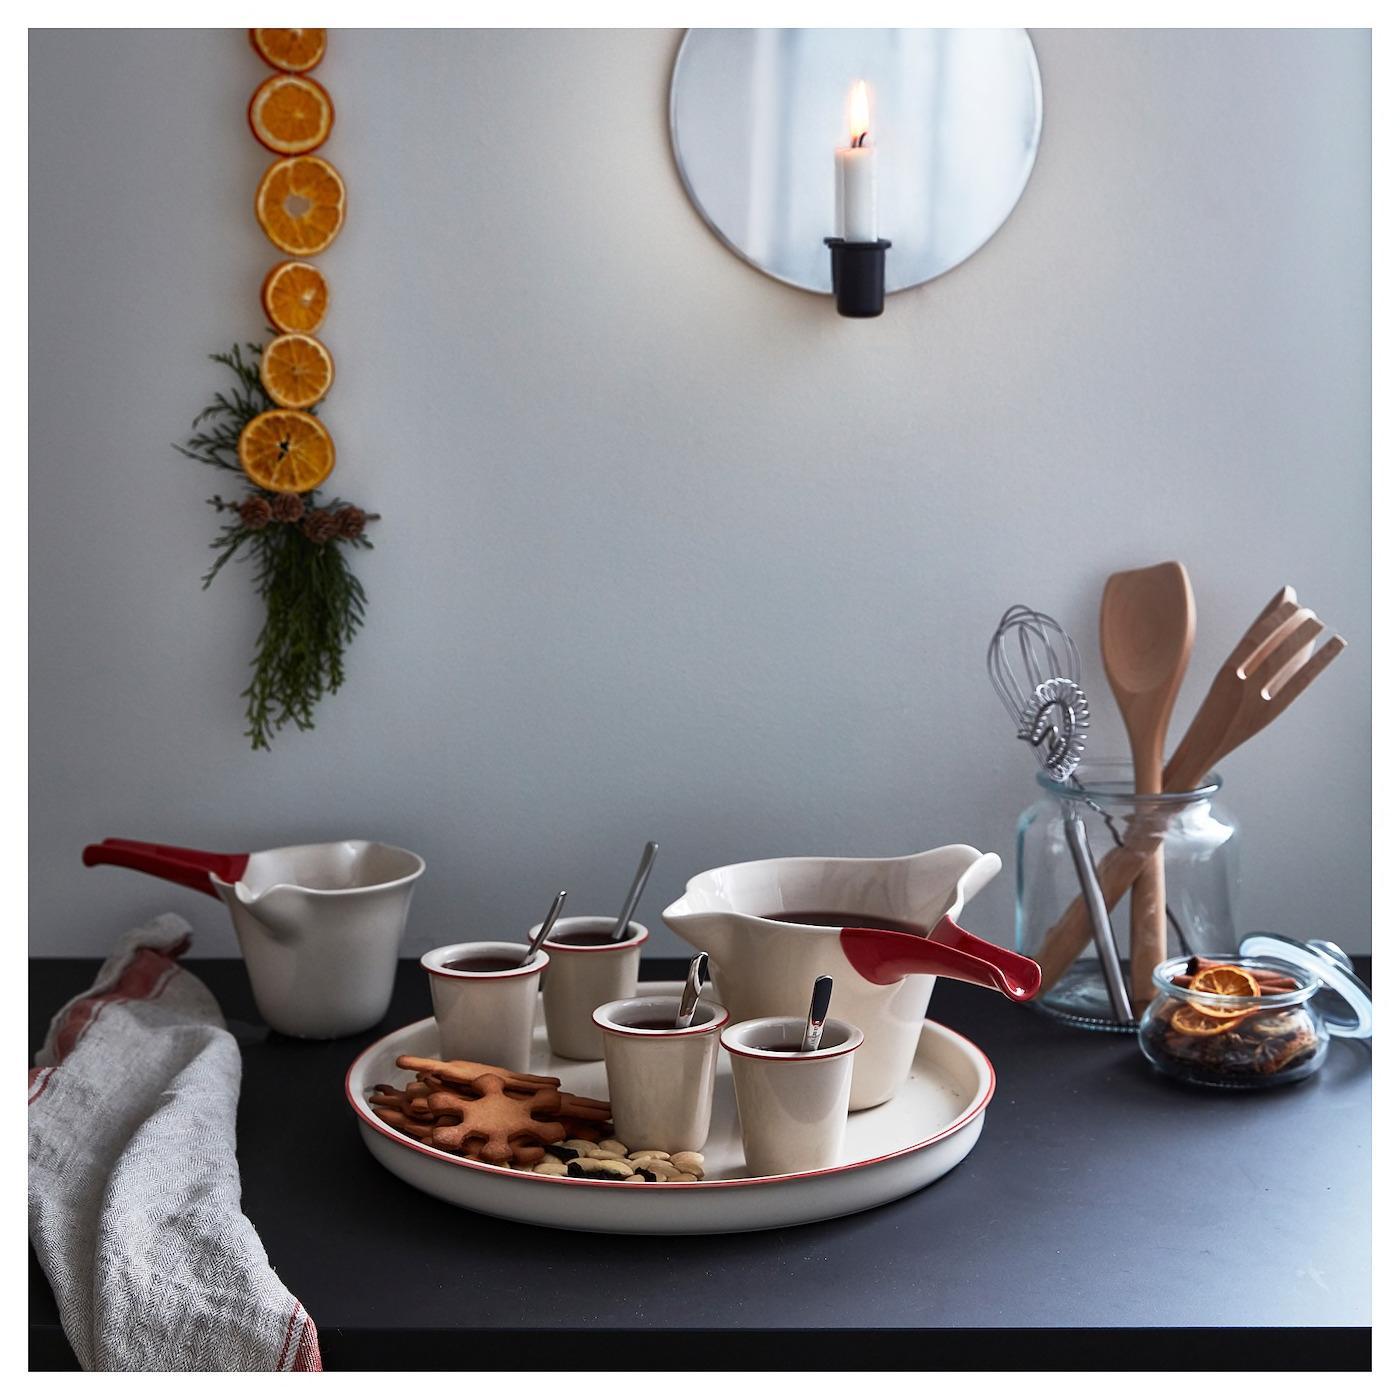 Set bicchieri e brocche VÄRMER - Design e foto by Ikea